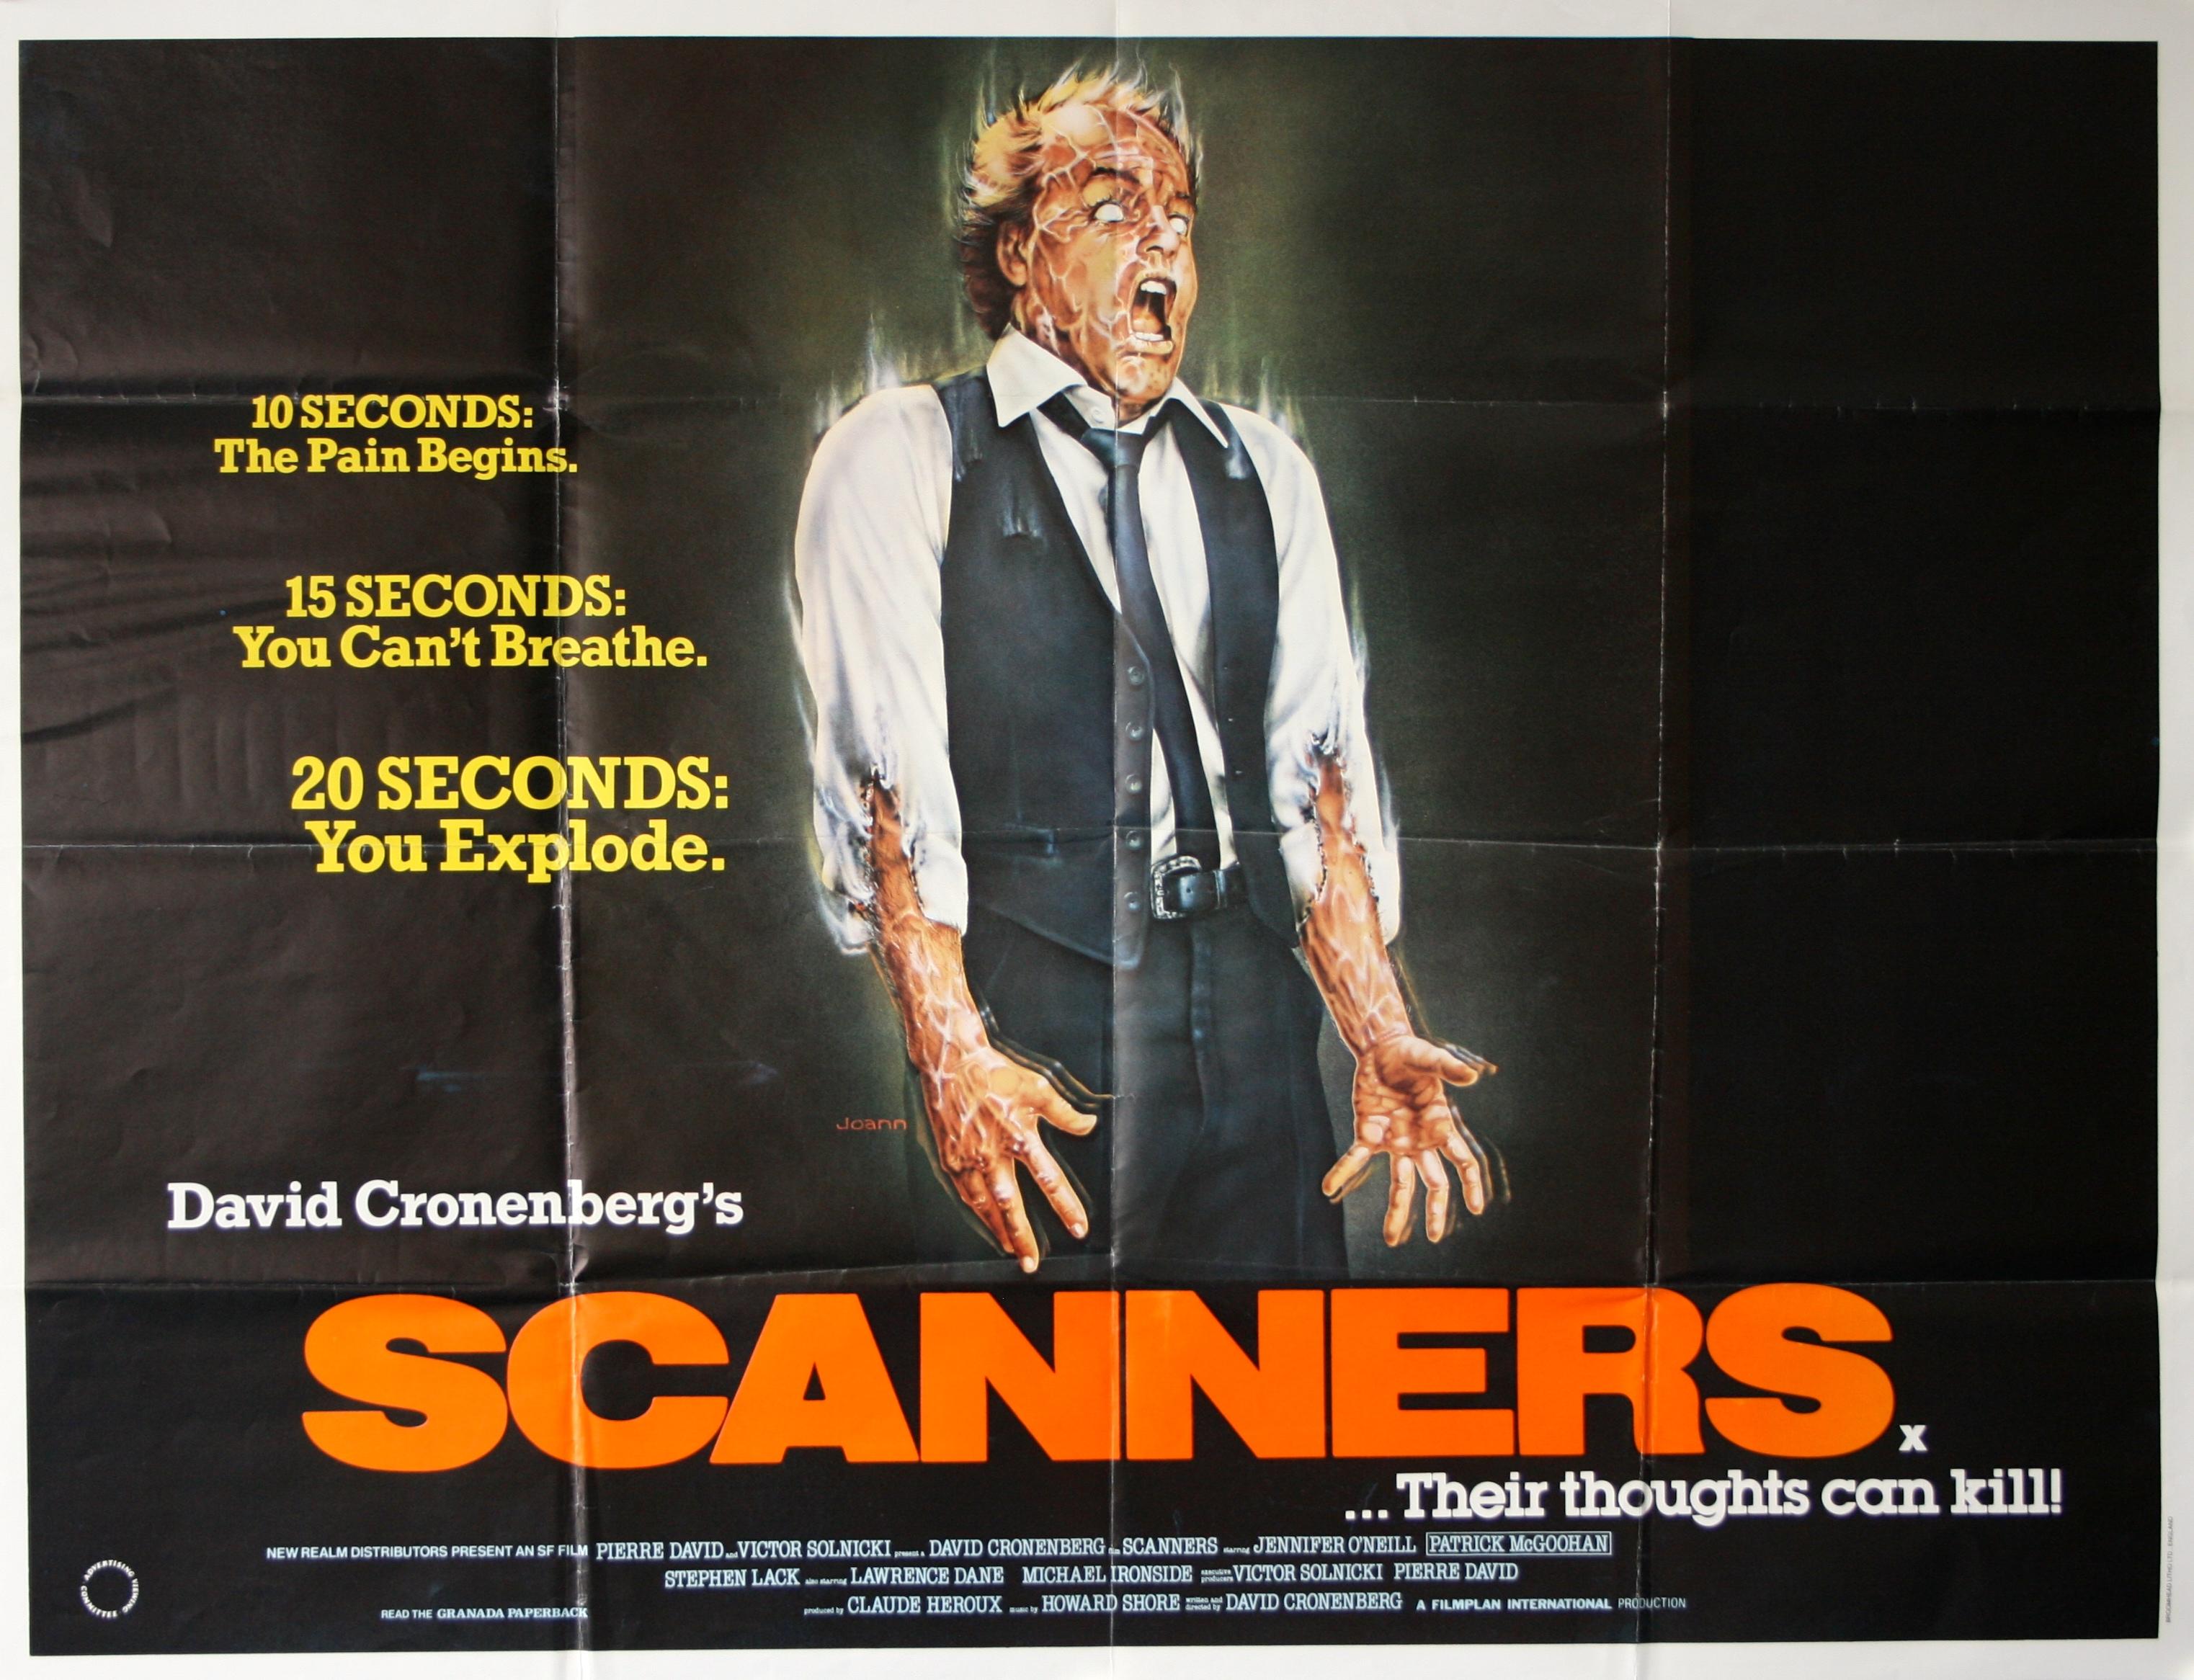 scanners cover.jpg